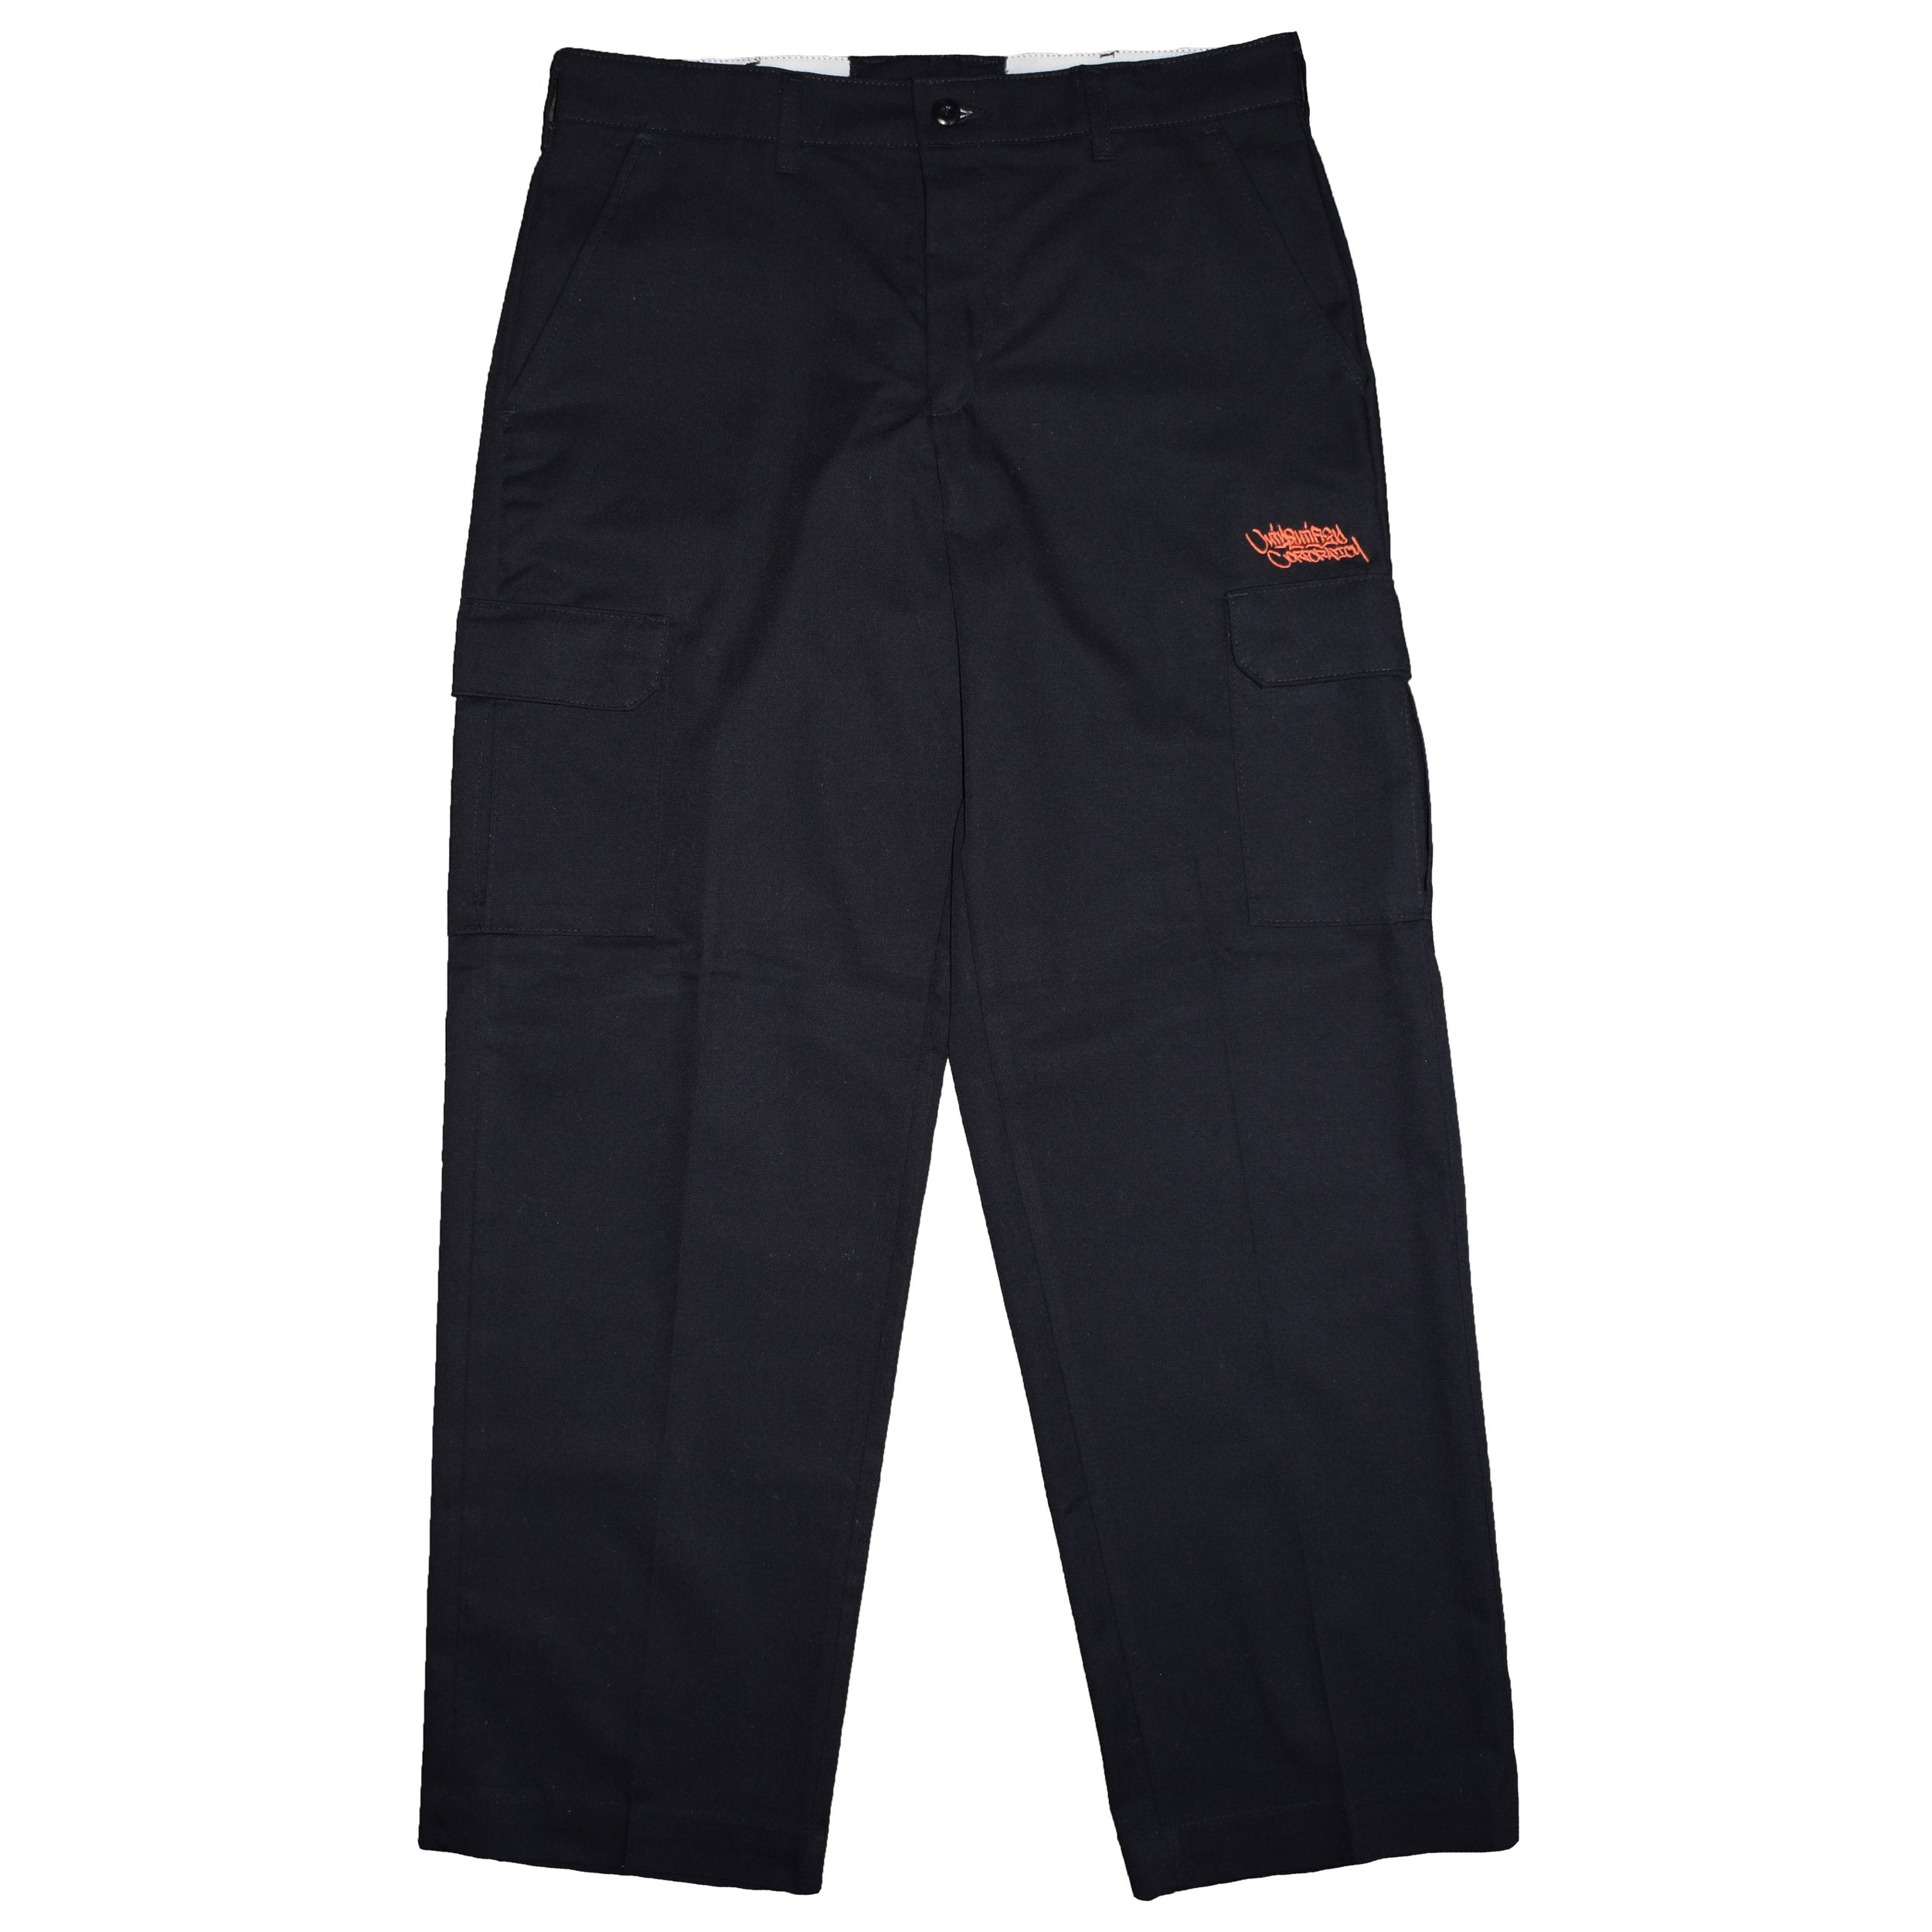 Cargo Pants Black Square.jpg